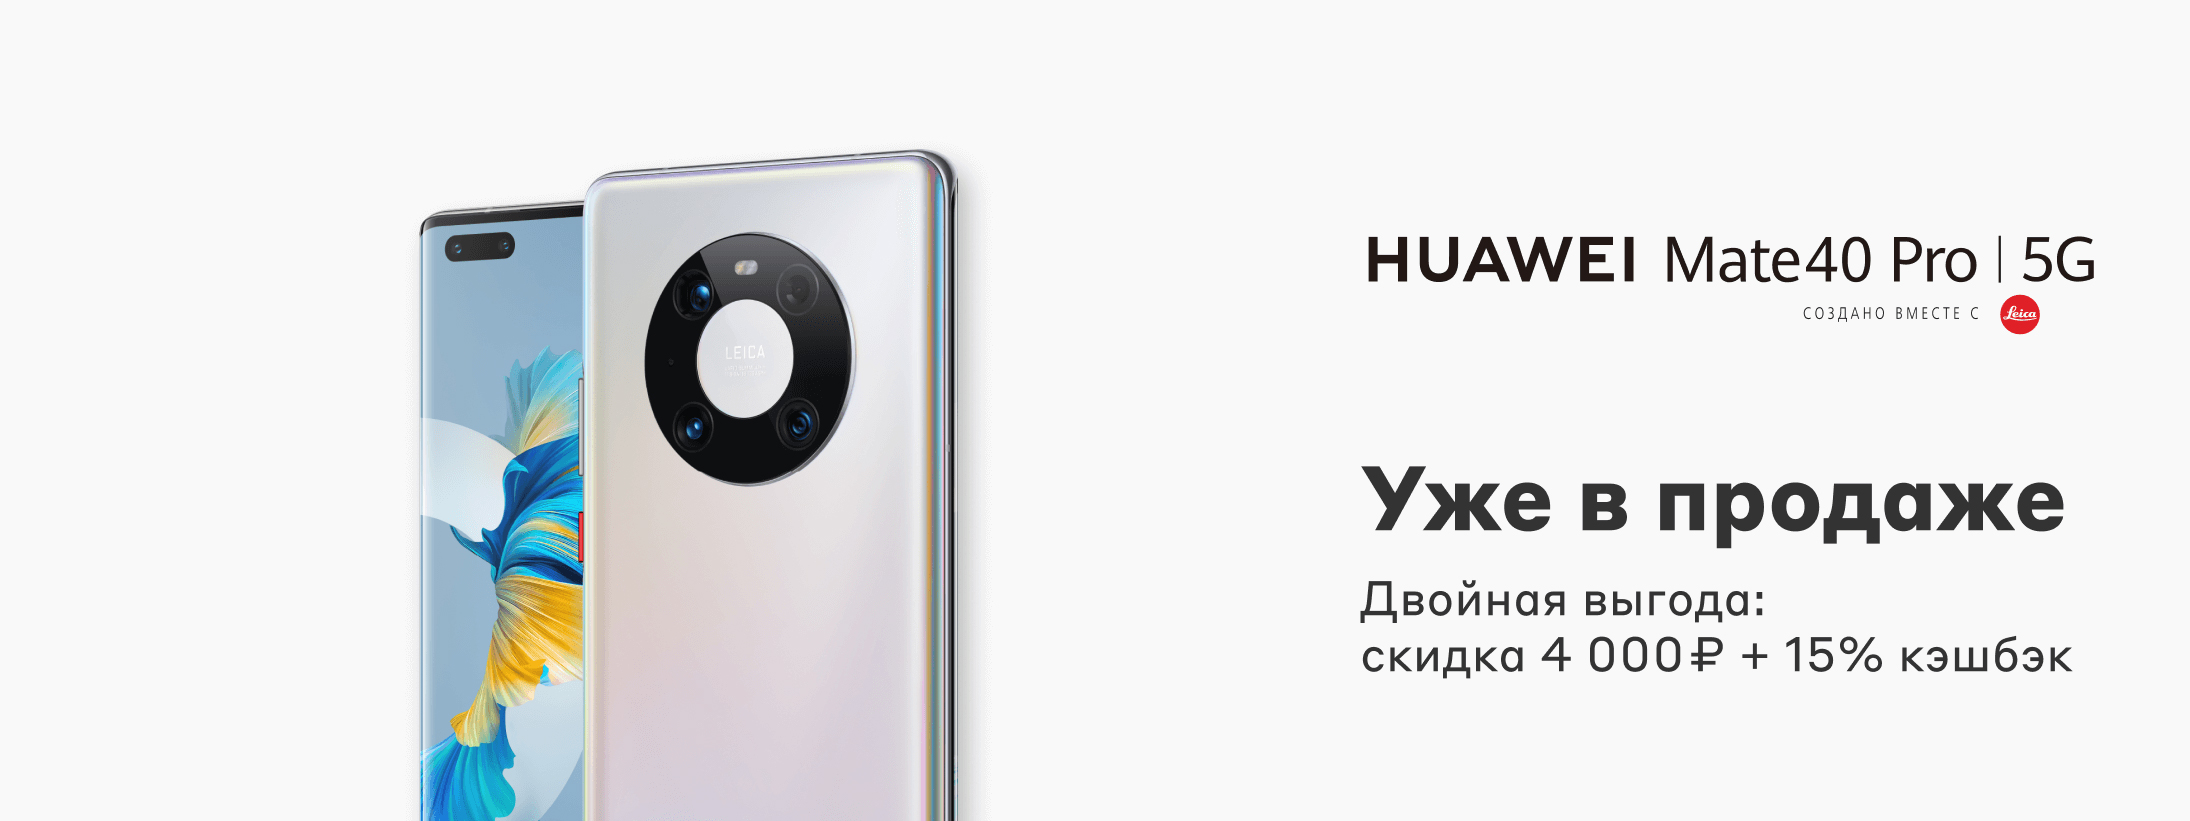 HUAWEI Mate 40 Pro со скидкой 4 000 рублей + кэшбэк 15%